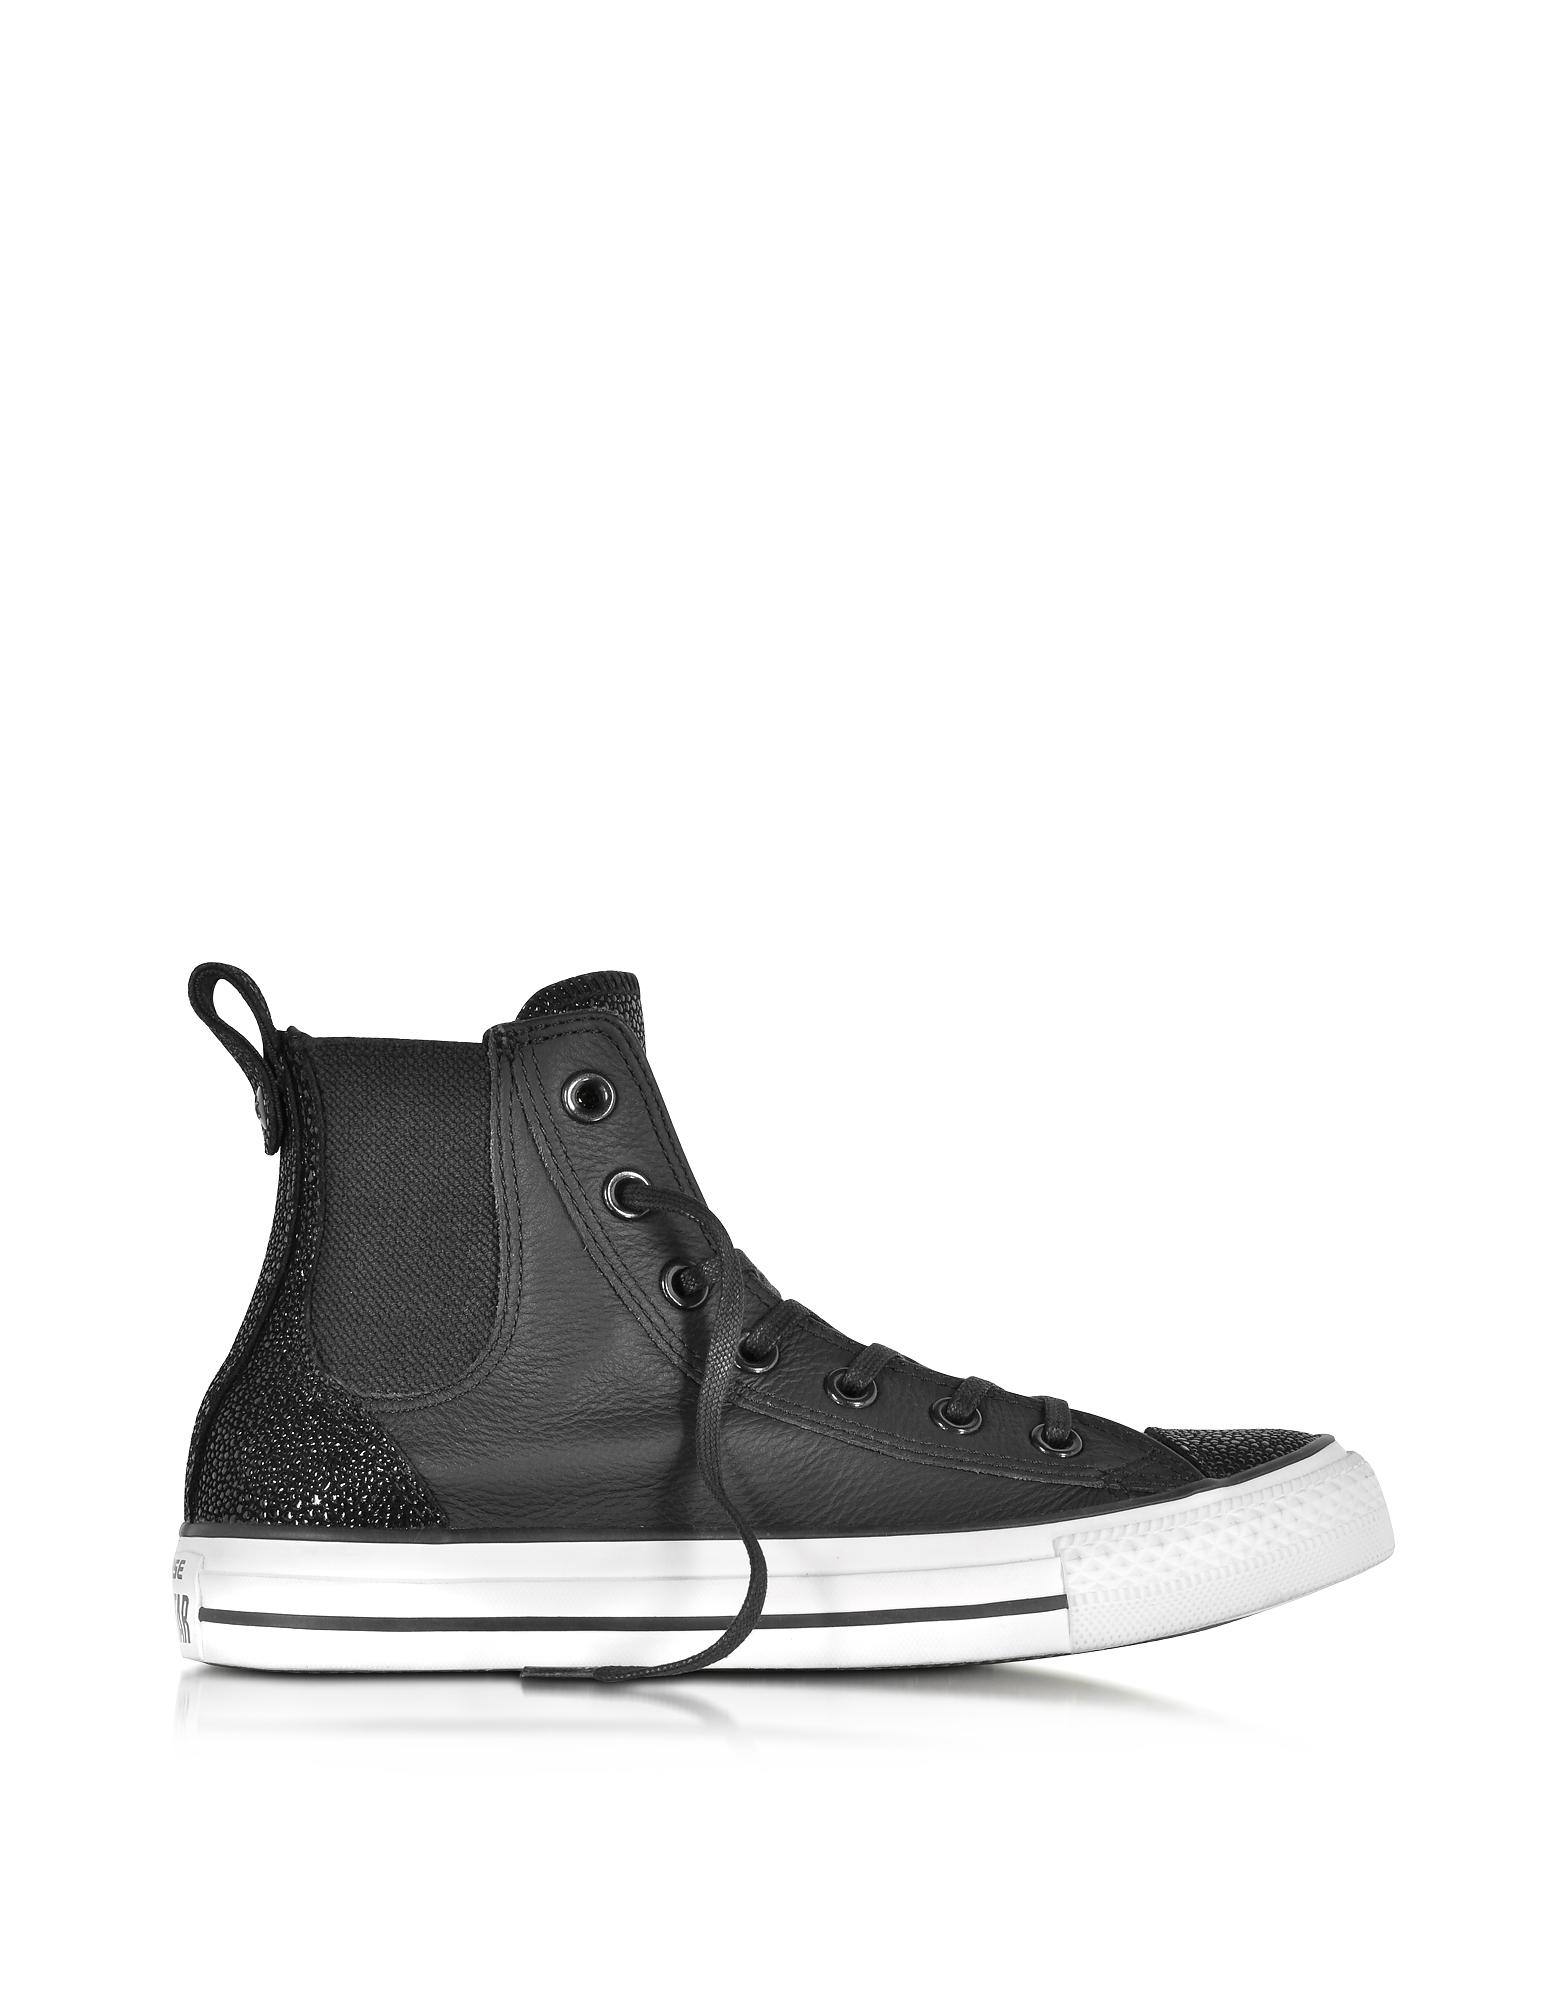 Converse Limited Edition All Star - Высокие Черные Кожаные Женские Кеды Chelsee